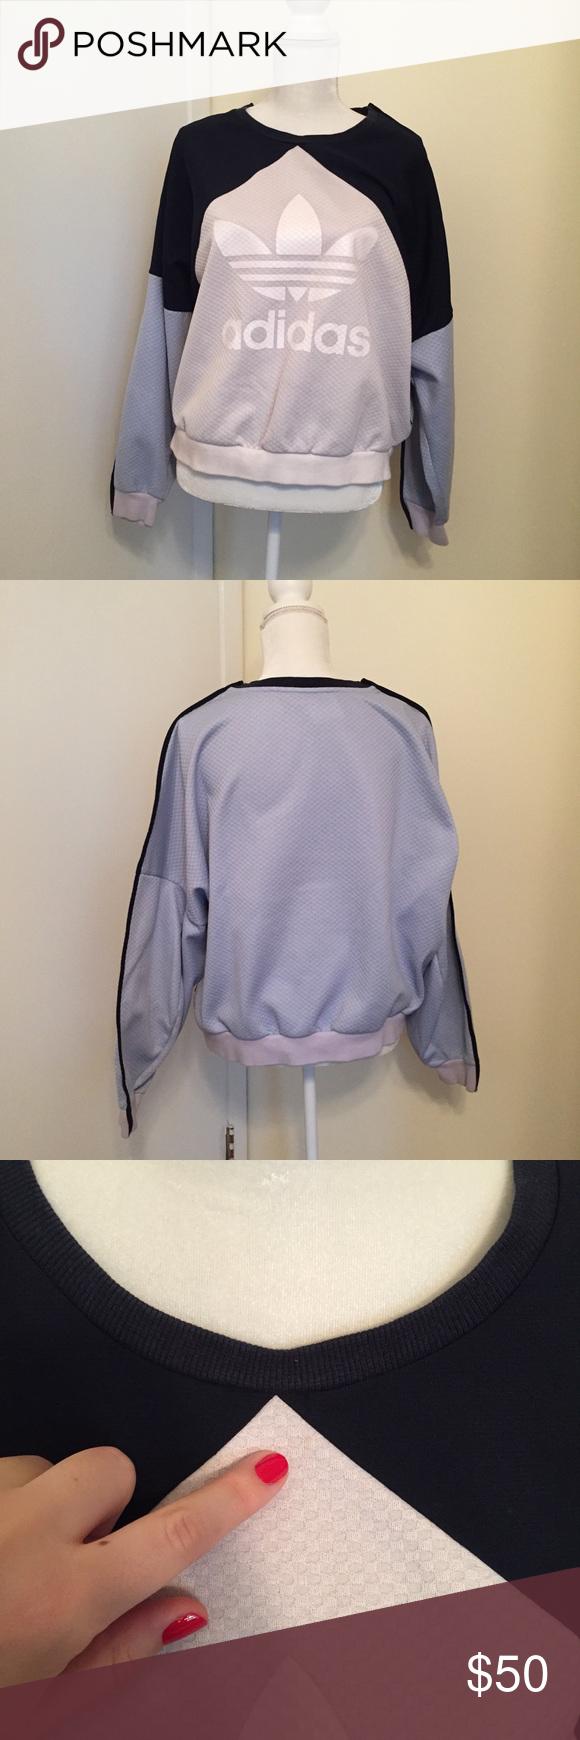 Adidas Sweatshirt Light Blue Navy Gray Adidas Sweatshirt Sweatshirts Clothes Design [ 1740 x 580 Pixel ]